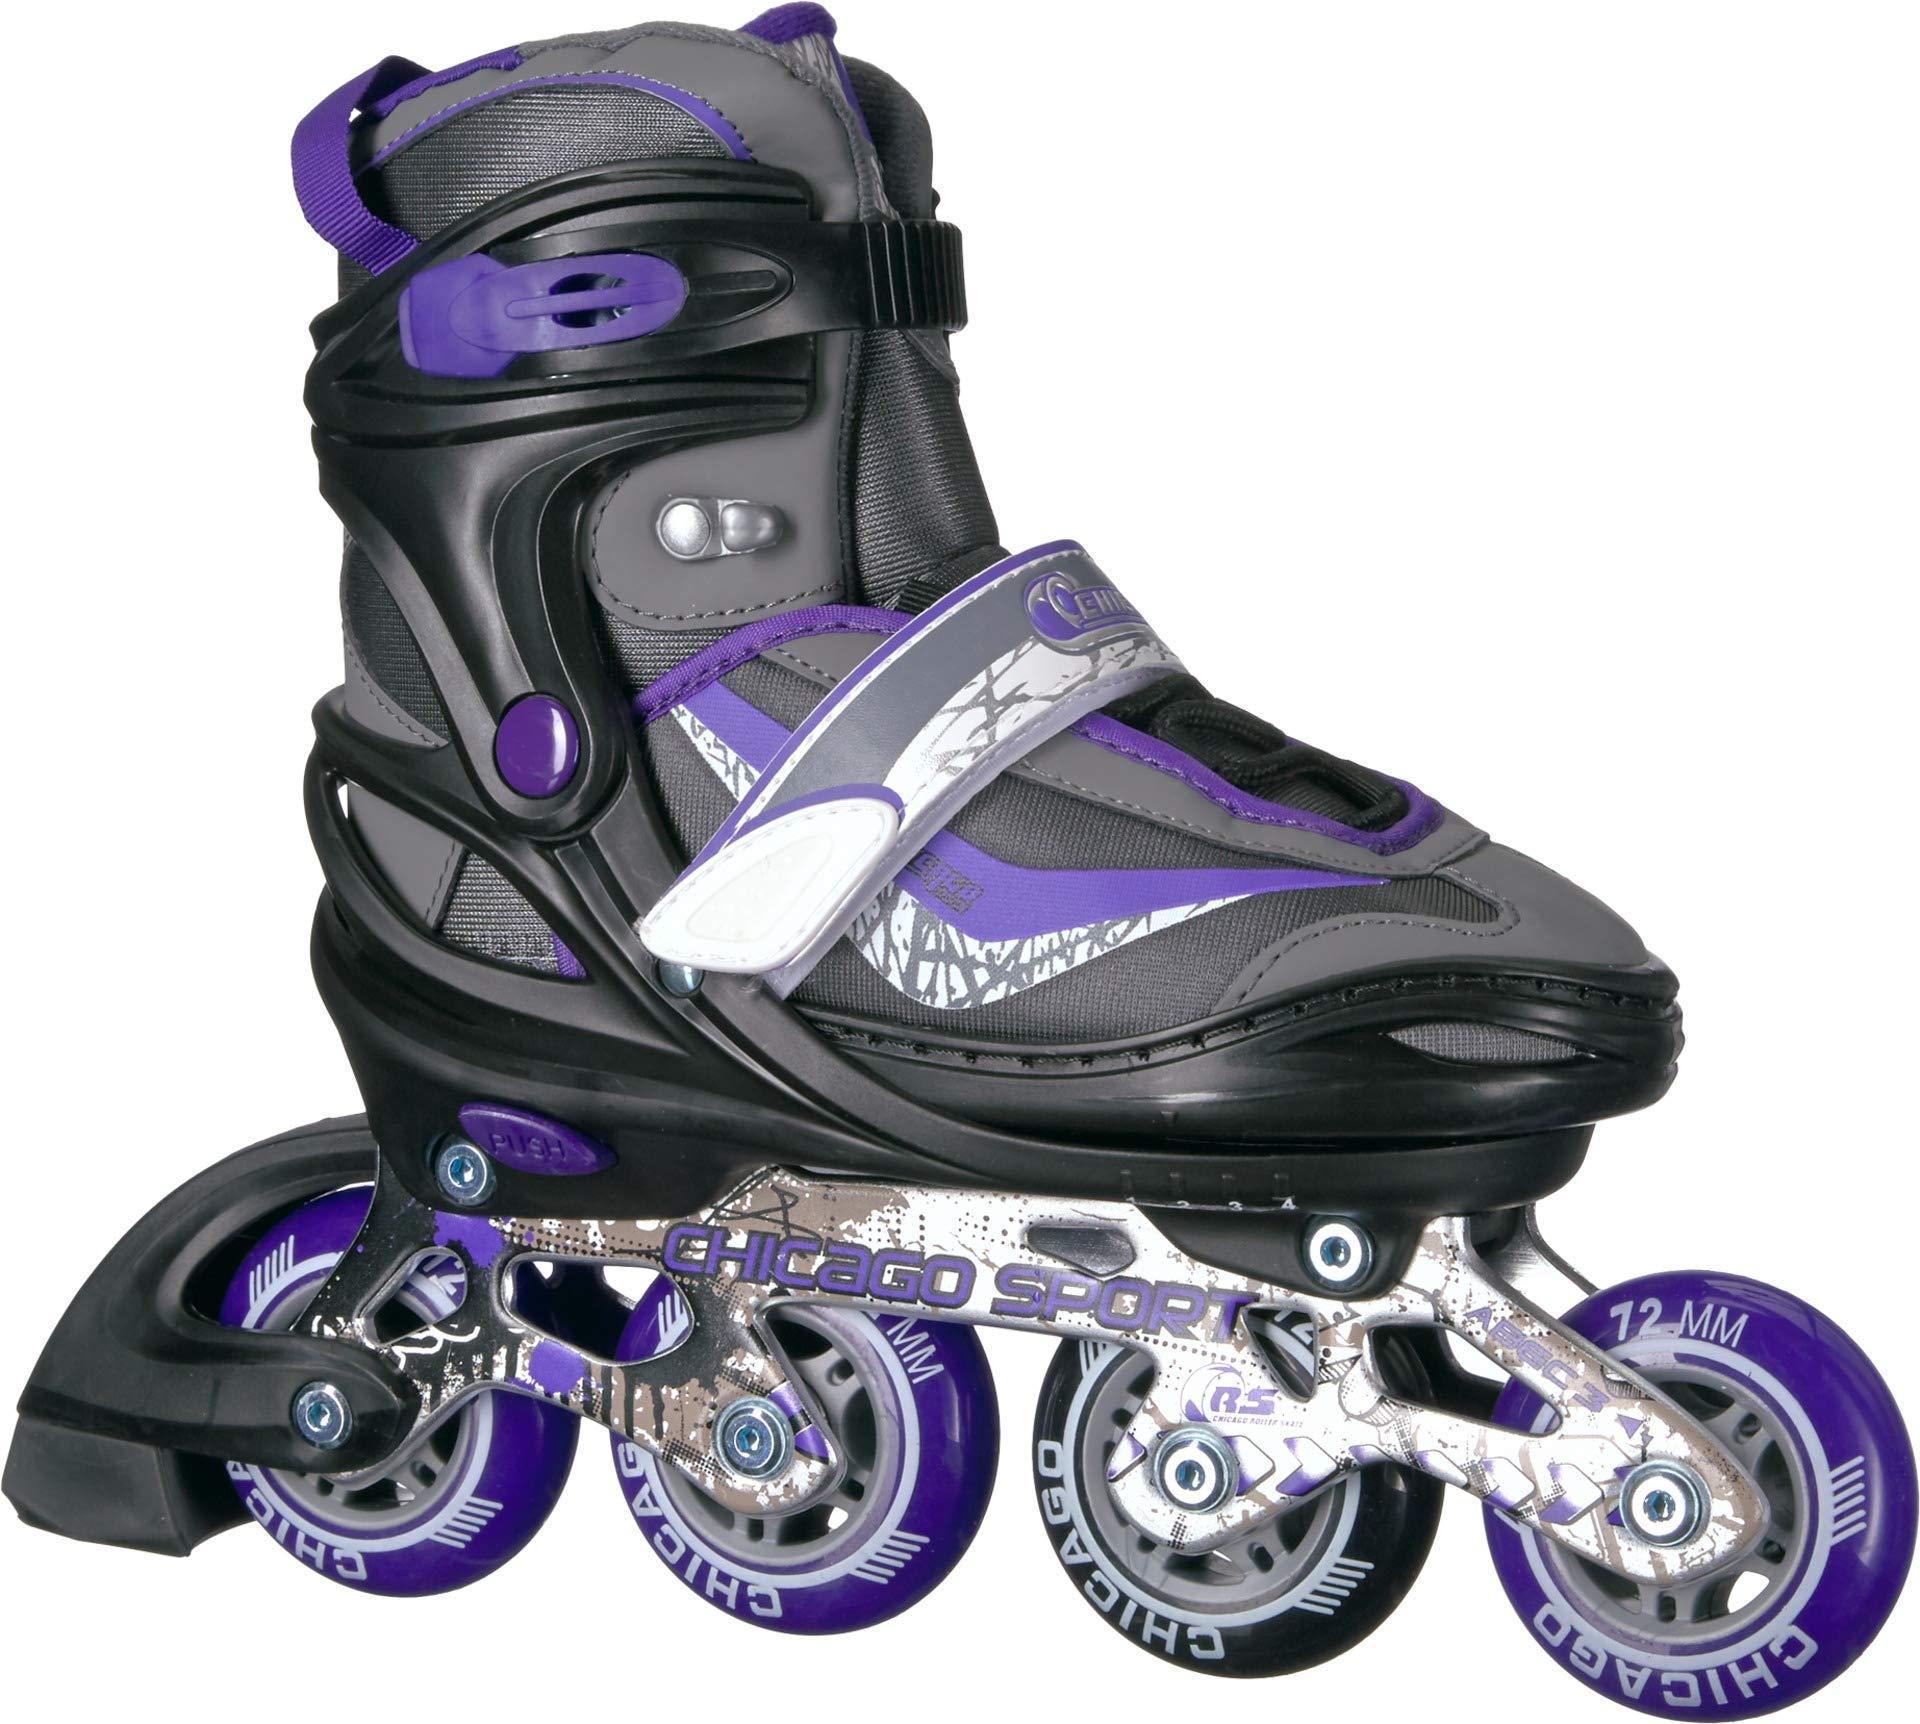 Chicago Adjustable Purple Inline Skates - Youth Large (Adjusts Size 5-8)